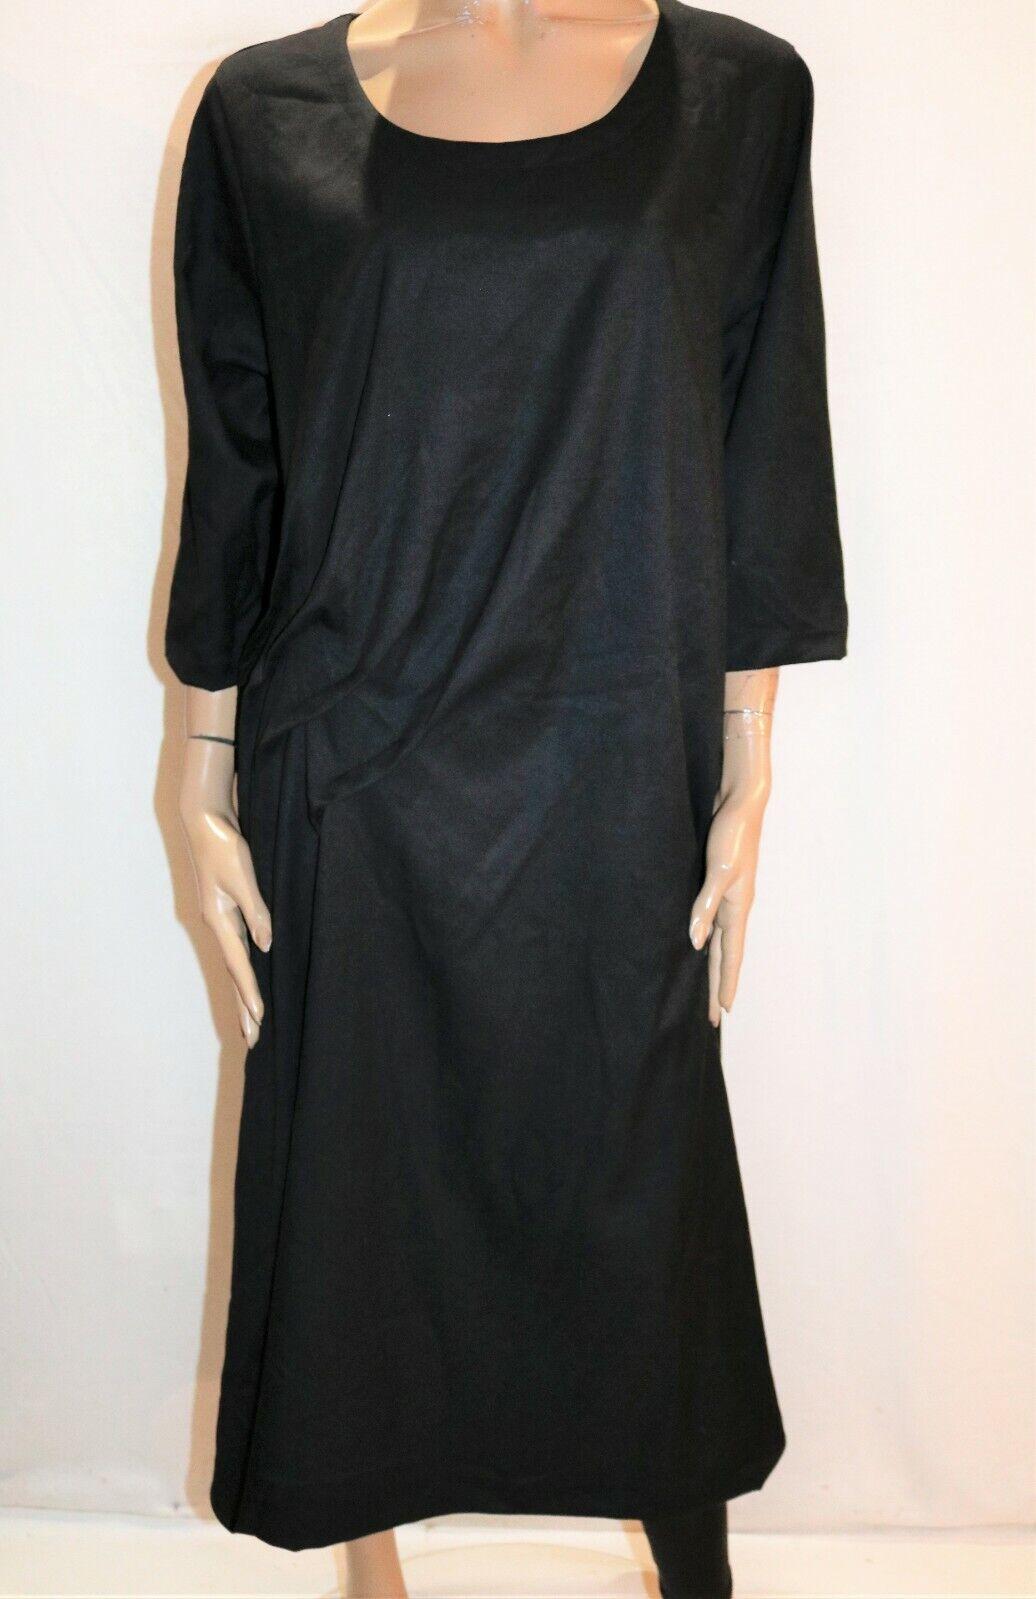 Animale Brand schwarz Pleated Side Short Sleeve Dress Größe 42 BNWT  TH100